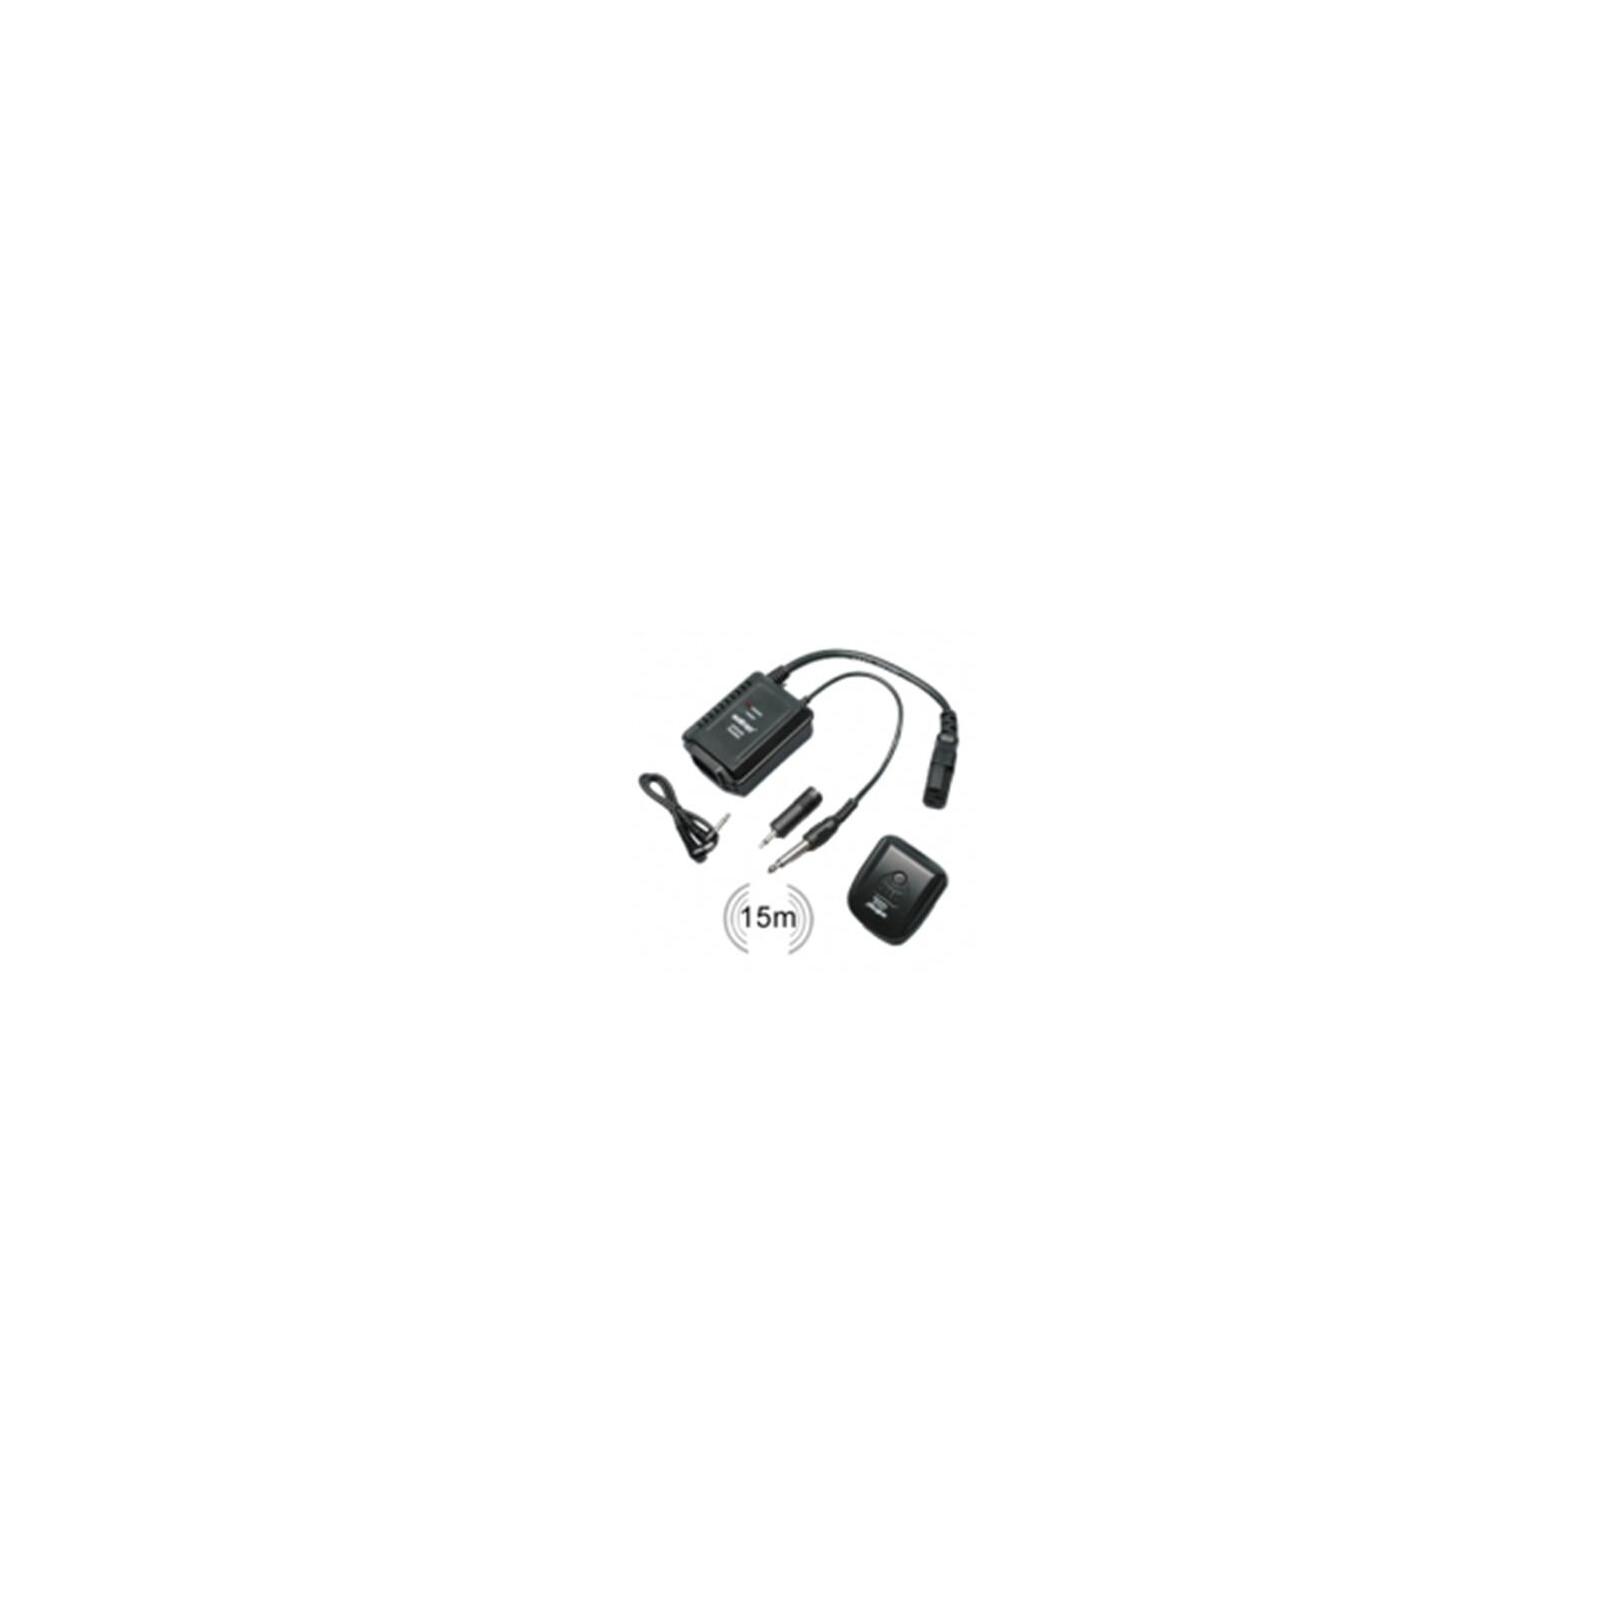 walimex 4-Kanal Funkauslöser-Set CY-A